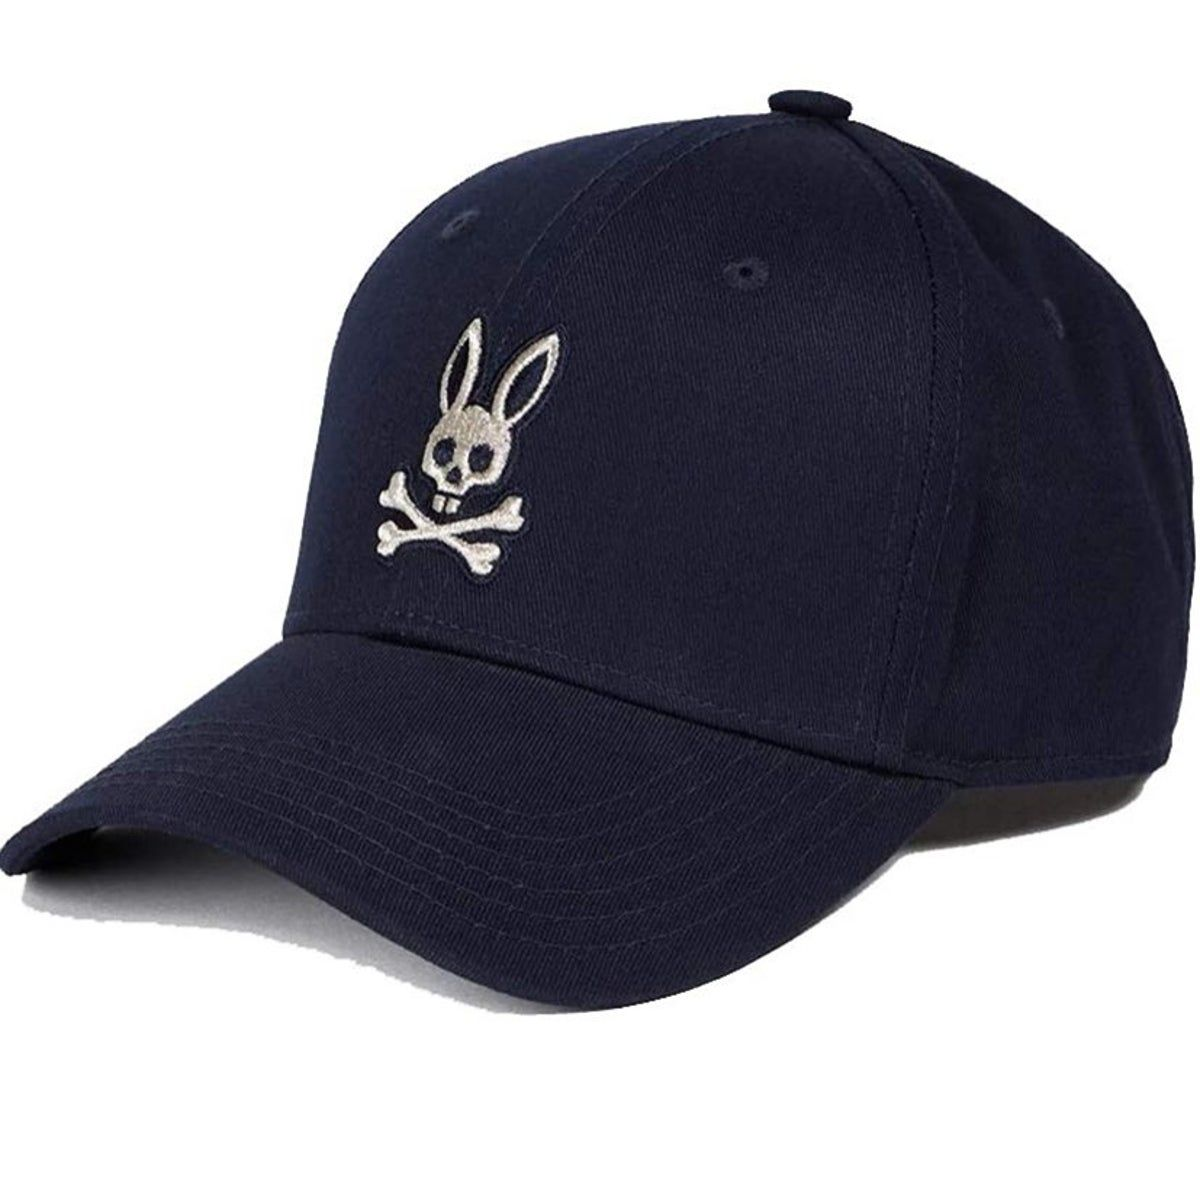 Psycho Bunny Men/'s Embroidered Strapback Hat Sports Cotton Twill Baseball Cap